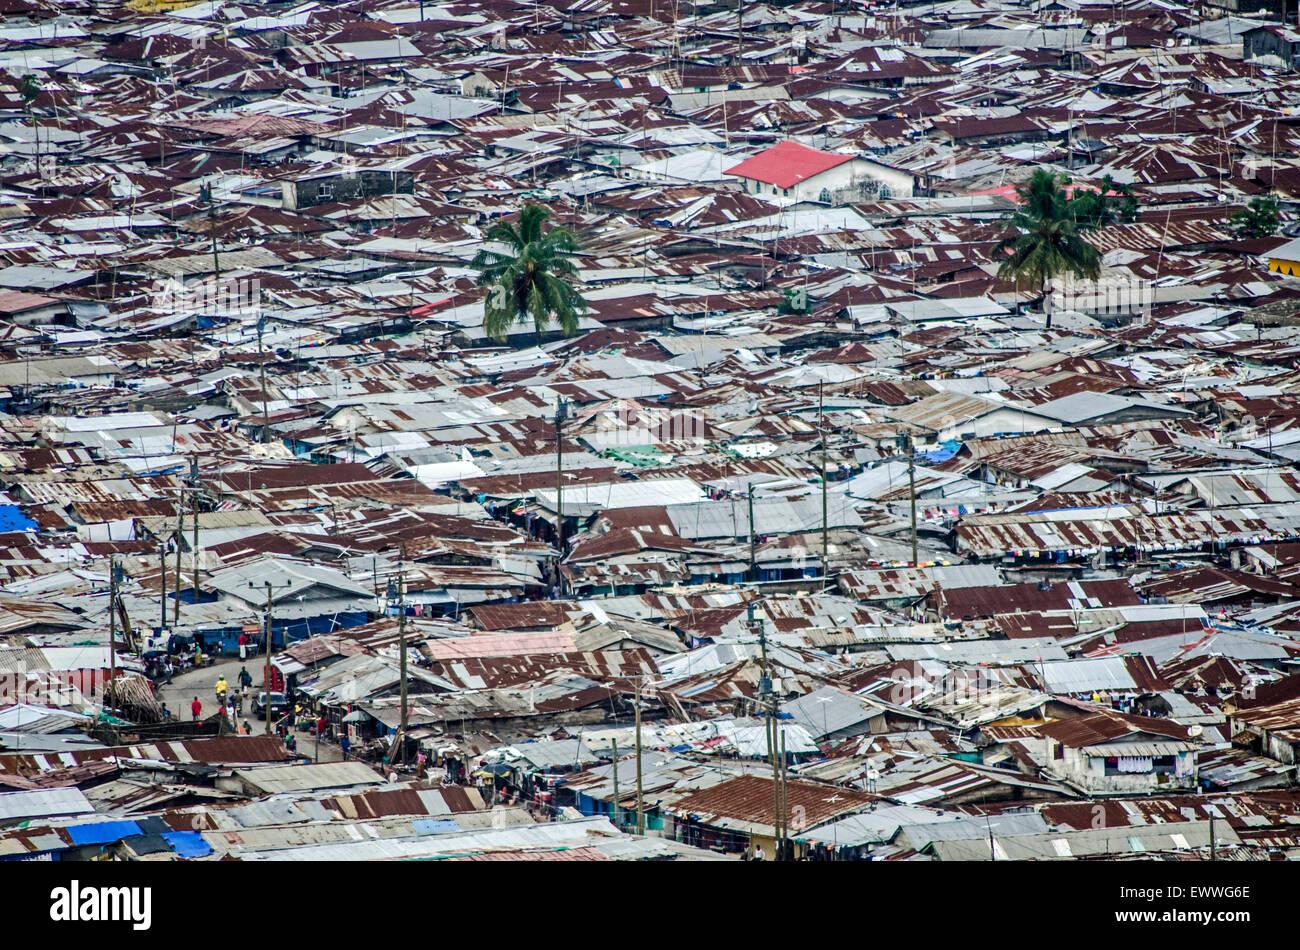 West Point, Monrovia, Liberia. - Stock Image